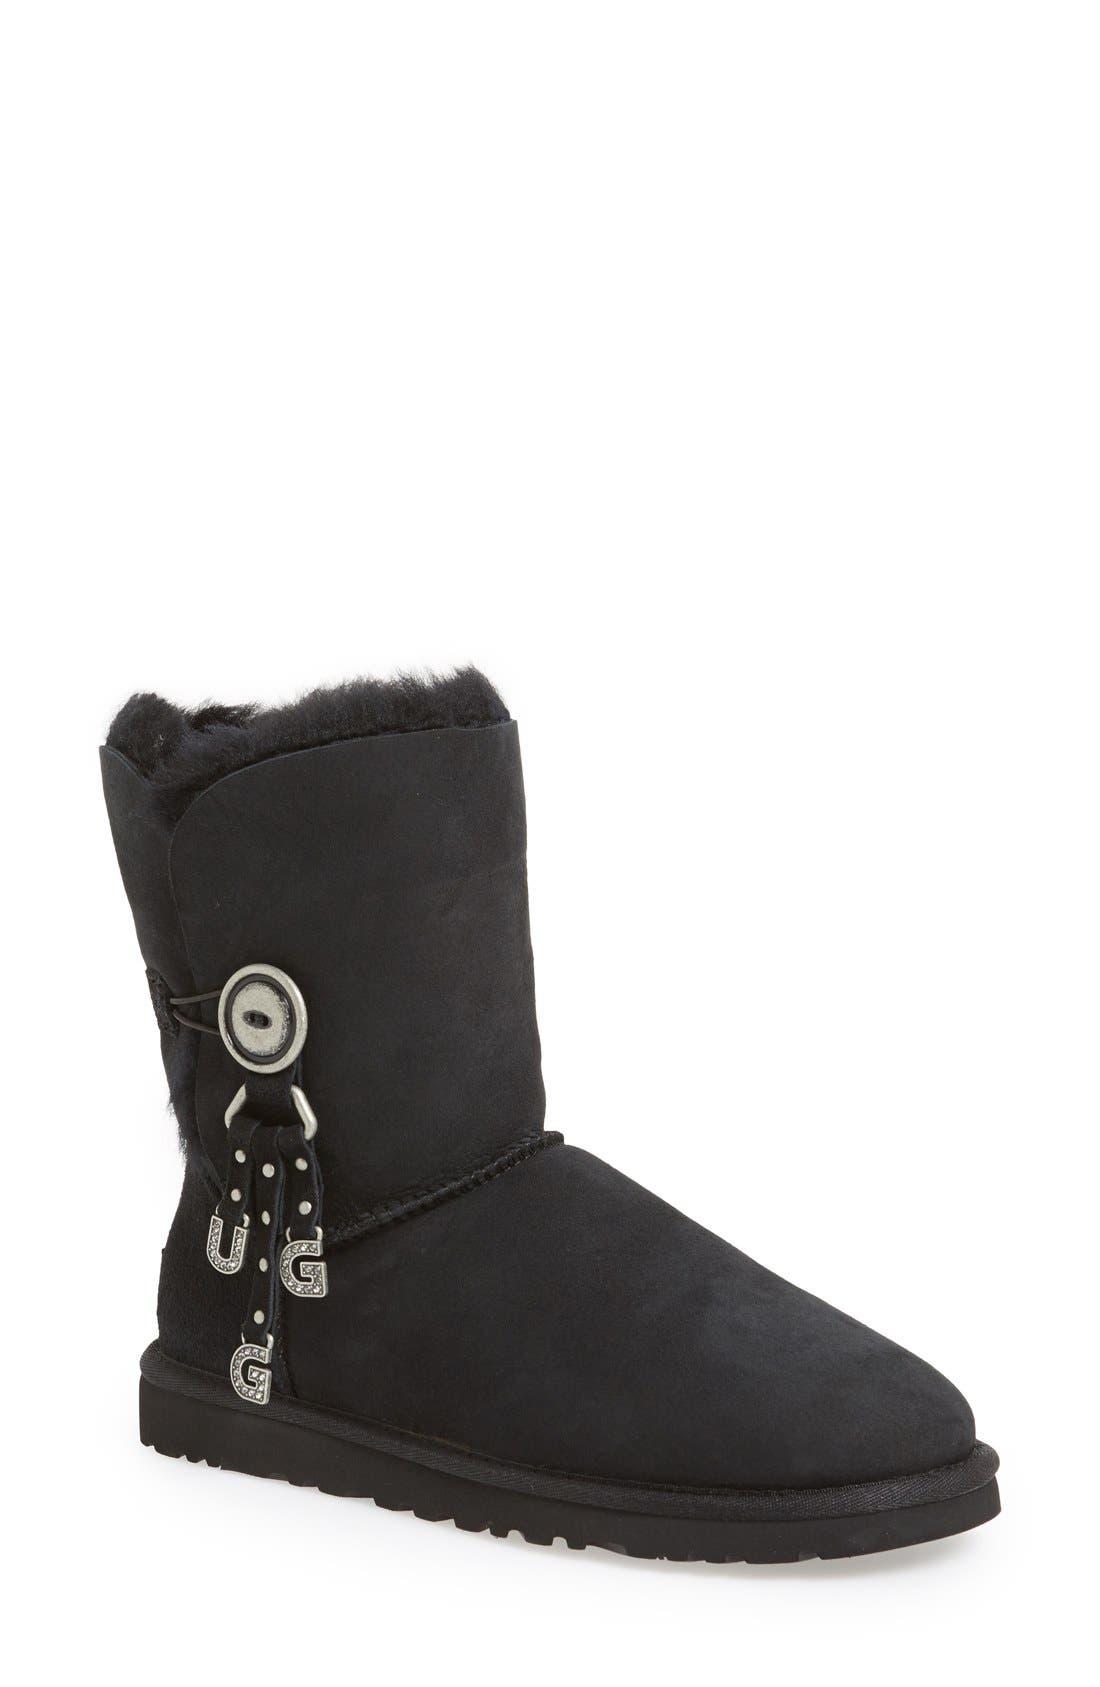 Australia 'Azalea Charm' Boot,                         Main,                         color, 001